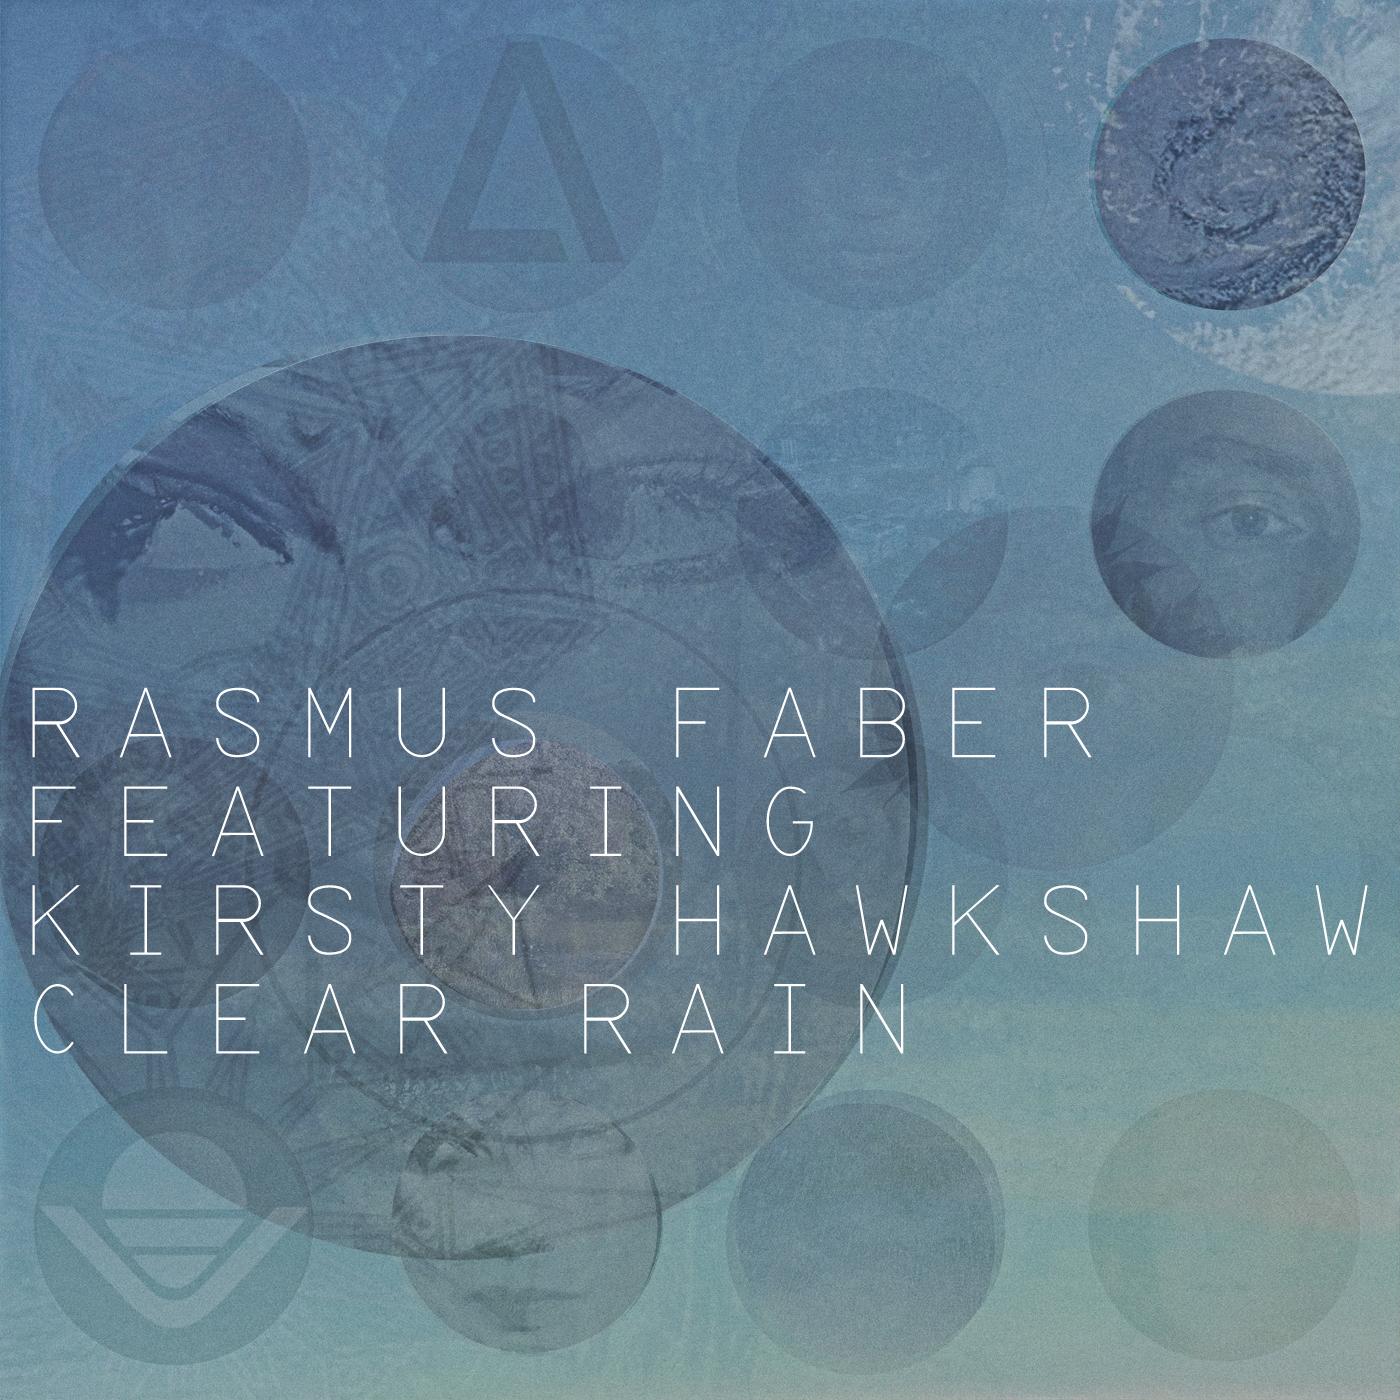 Rasmus Faber feat. Kirsty Hawkshaw – Clear Rain (Midori Aoyama Remix)